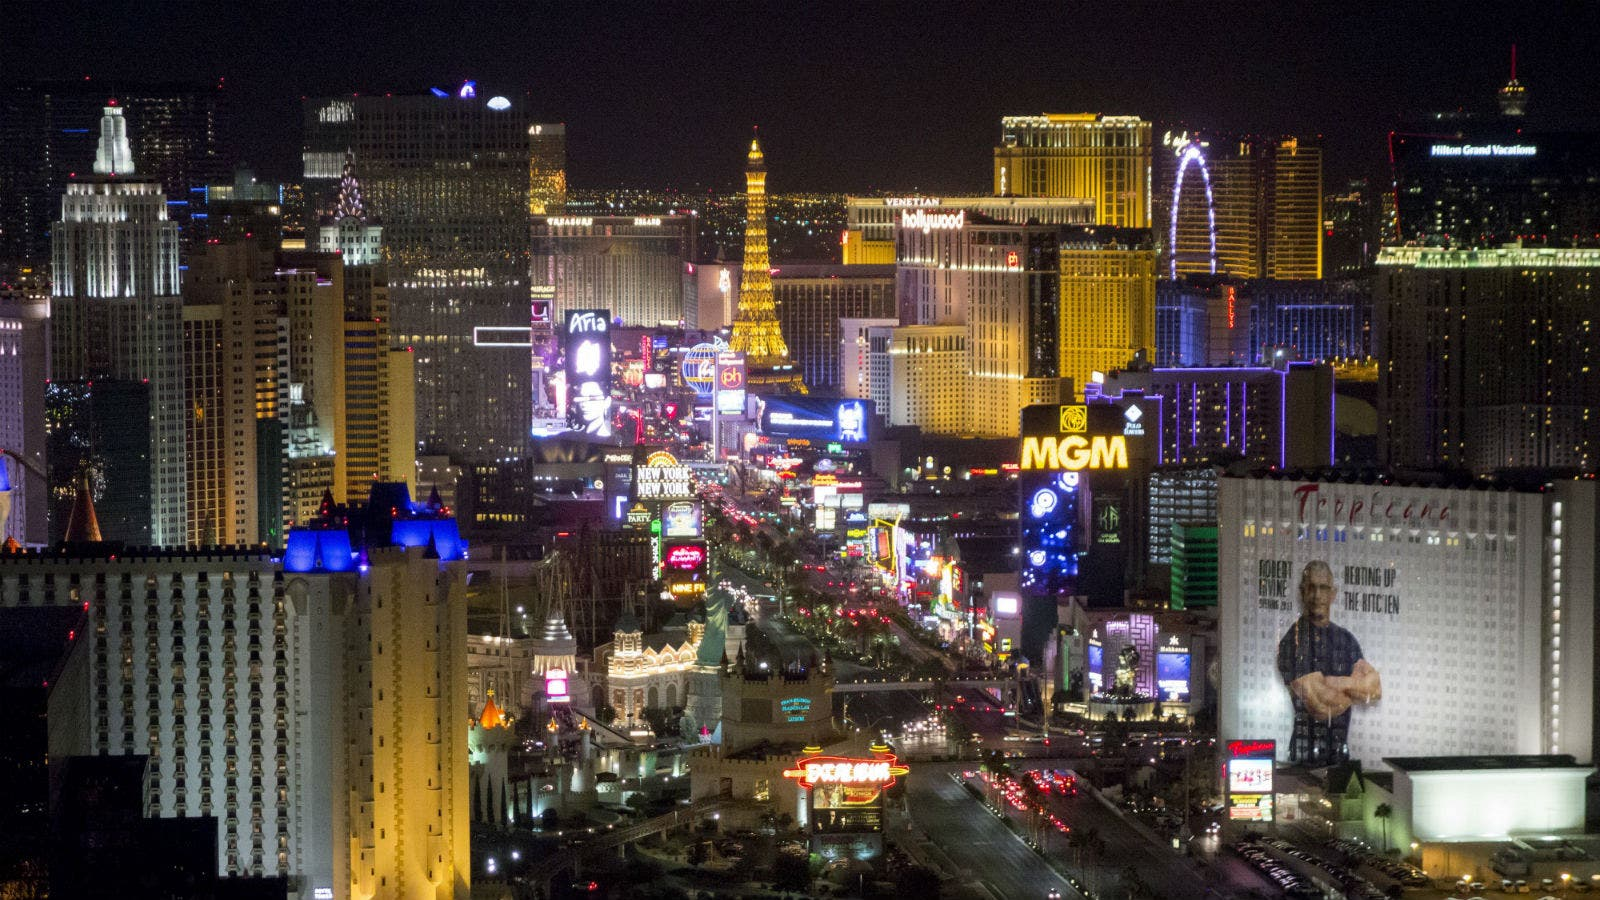 Starbucks barista beats sharps, wins $900k in Las Vegas